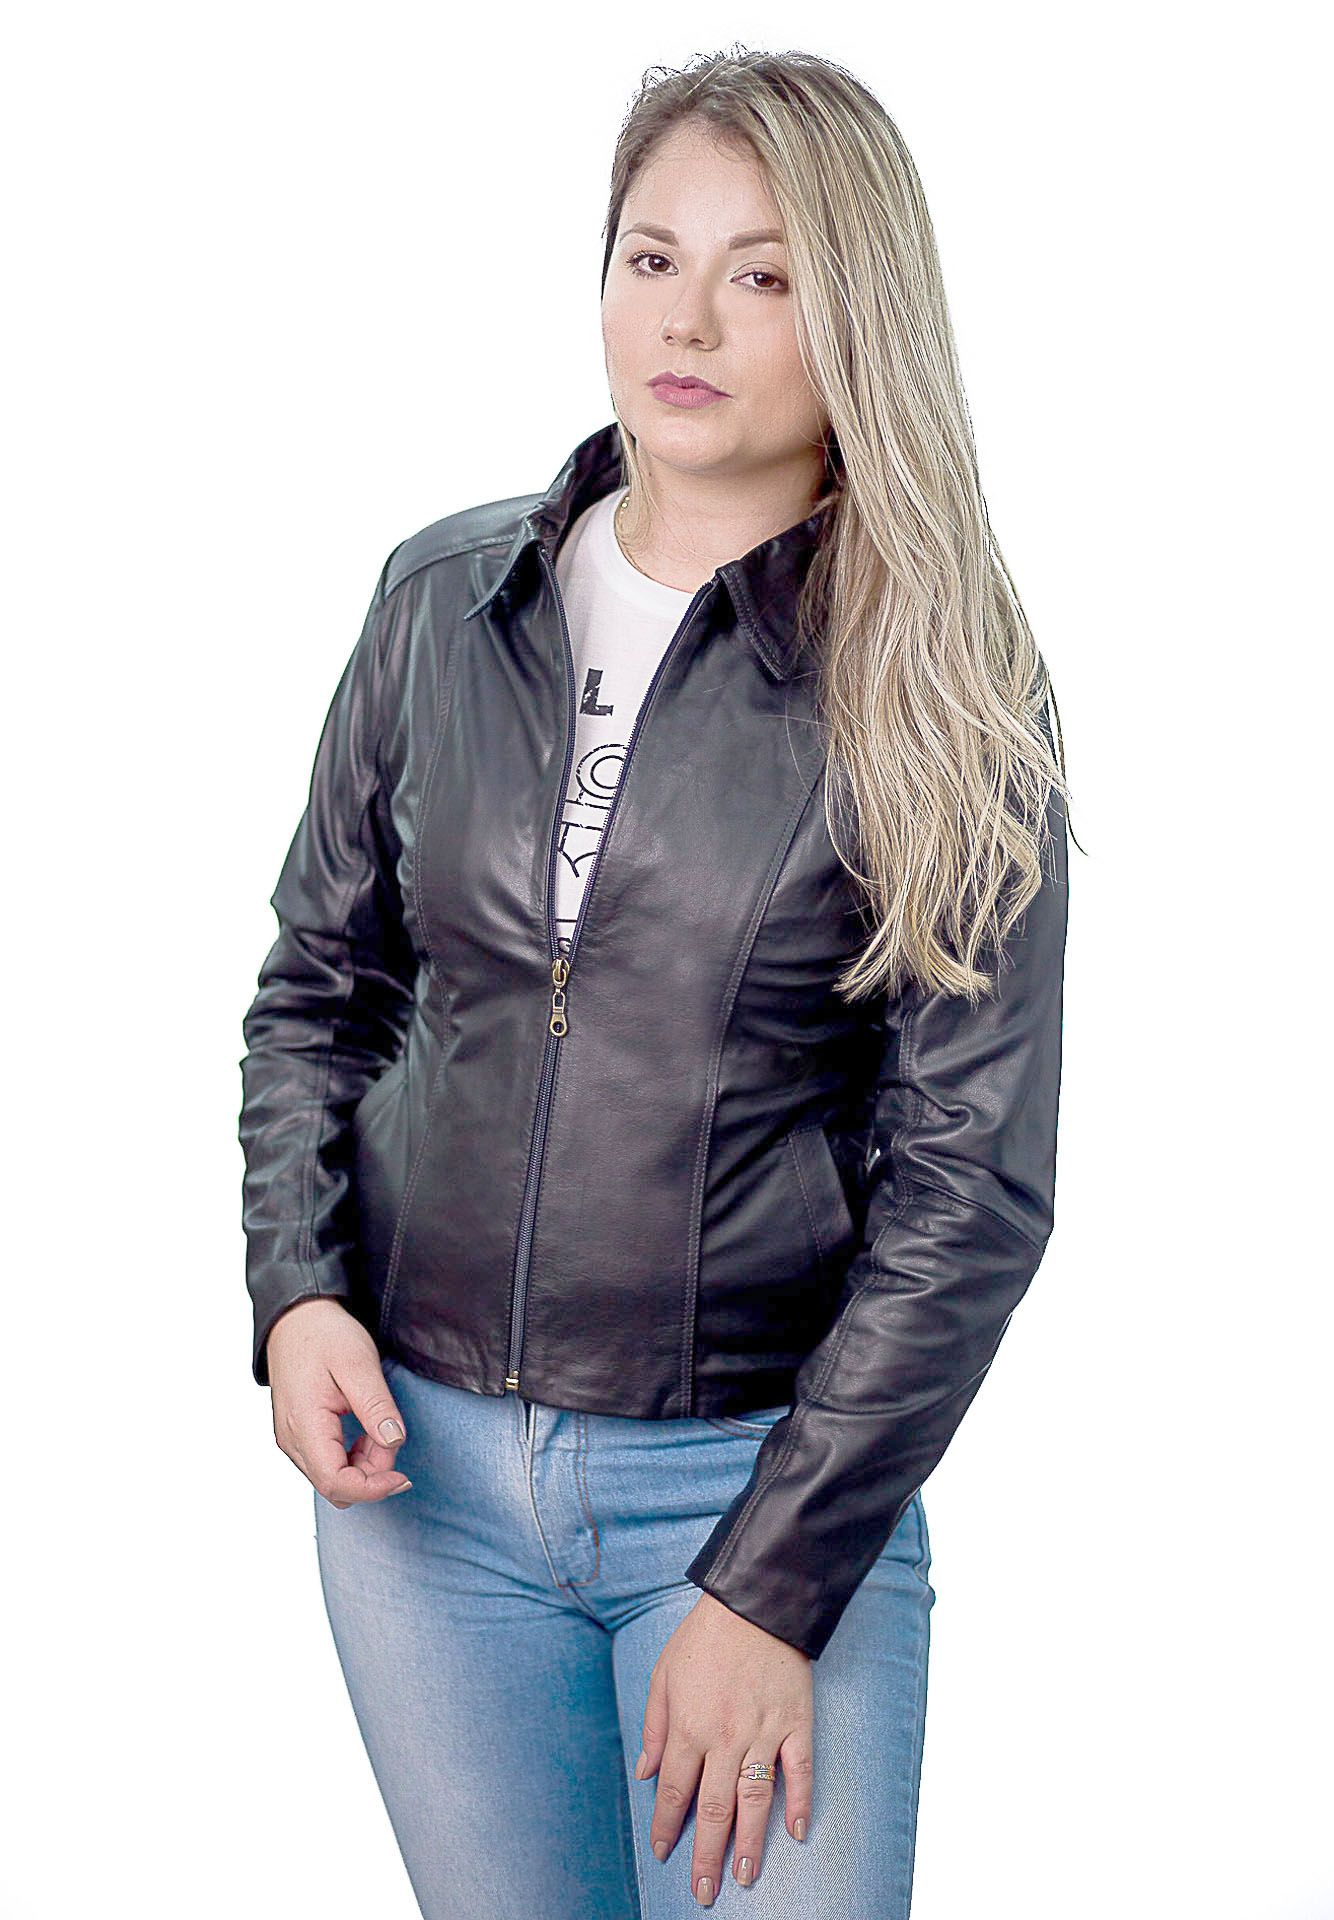 Jaqueta Feminina Prata Couro 101 Preta